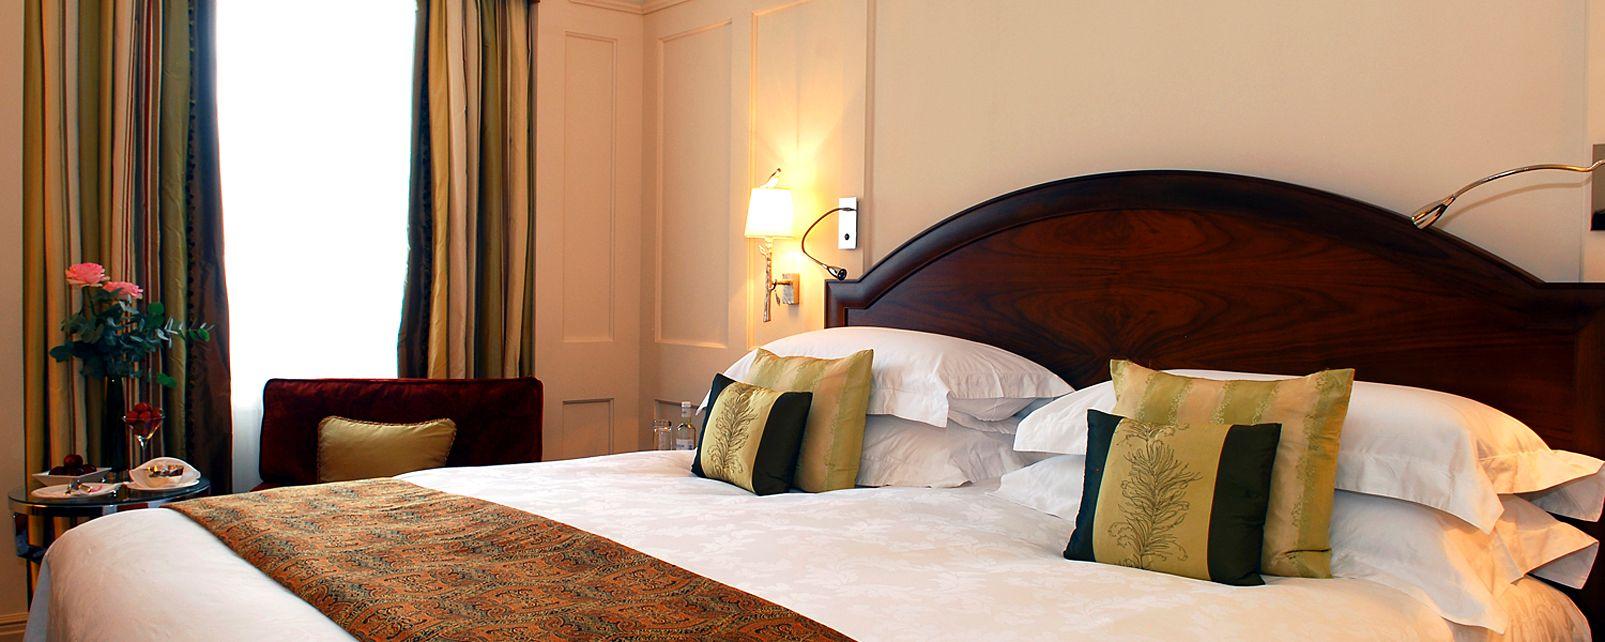 Hotel The Langham London